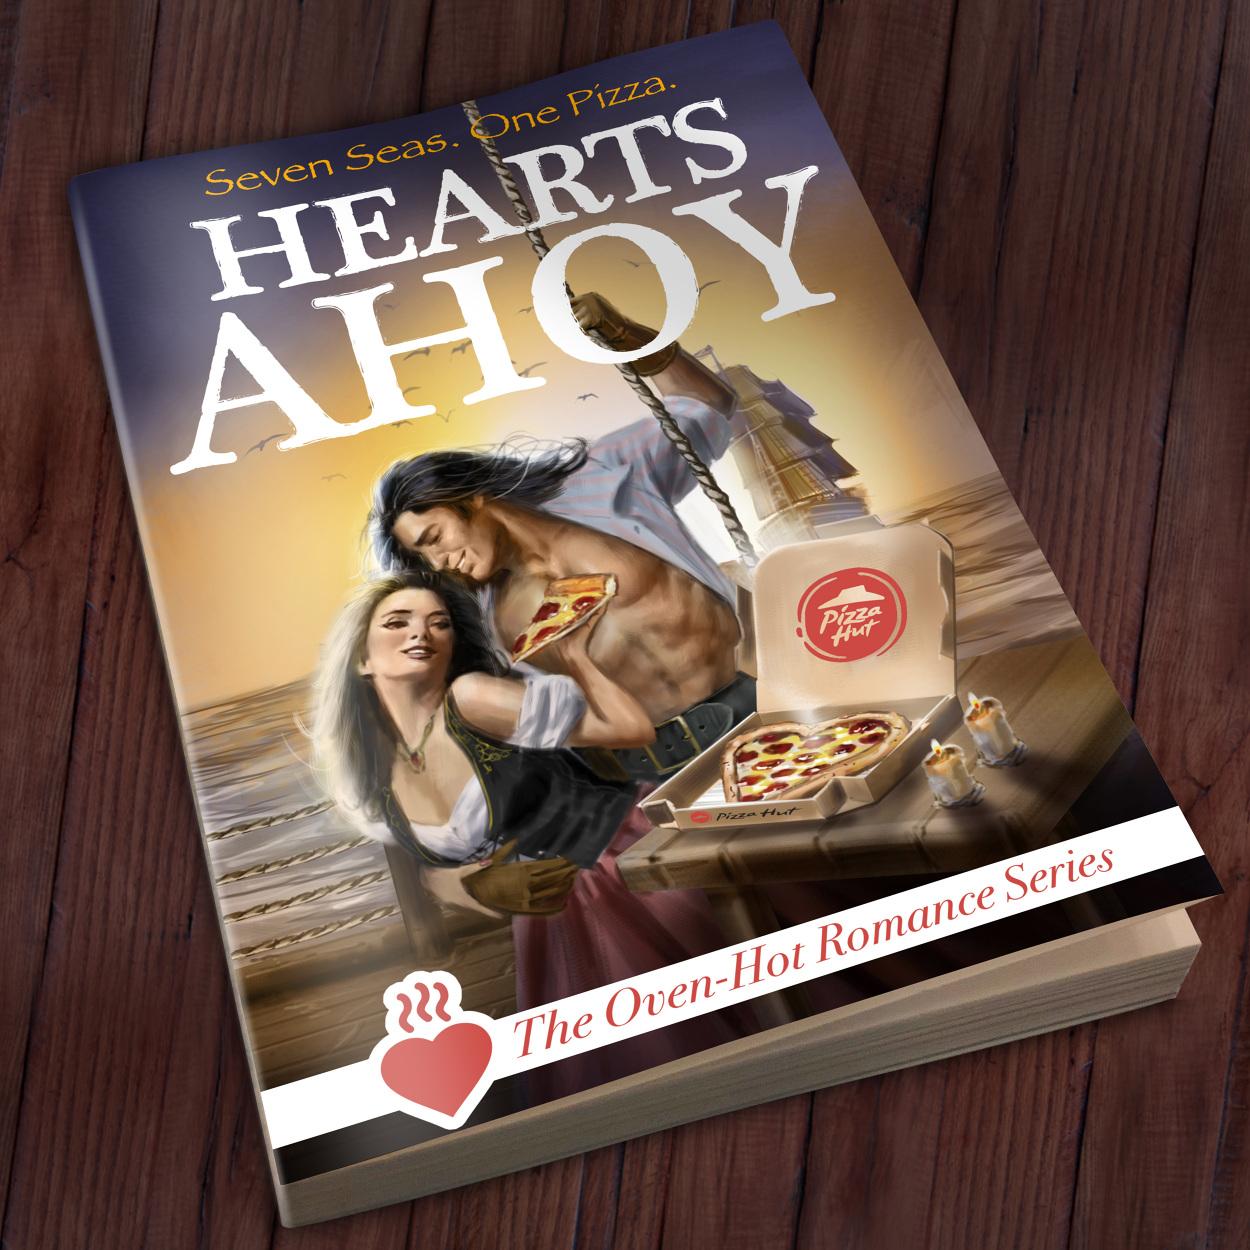 Oven-Hot Romance Novels - Meredith Grace White